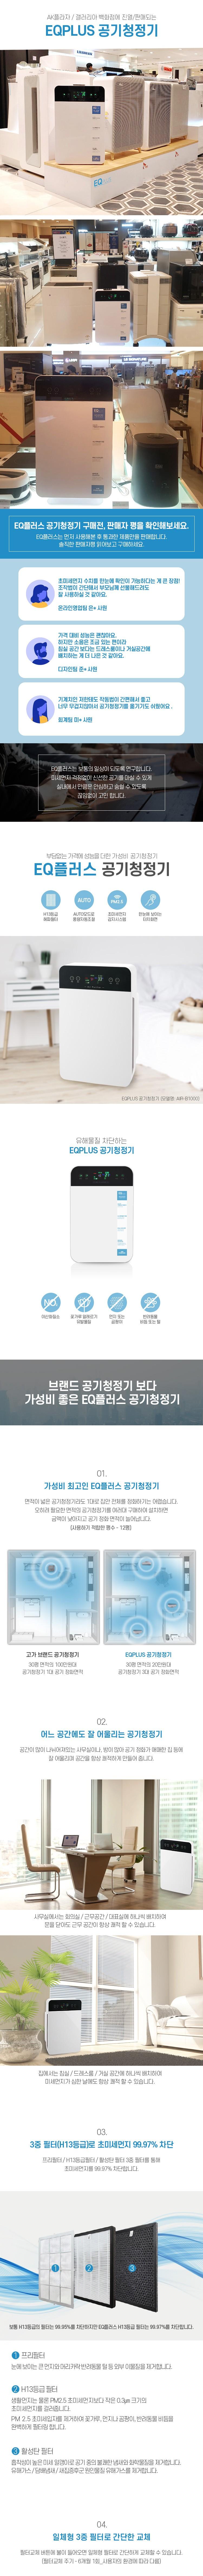 EQ플러스 2020년형 심플 디자인 공기청정기 H13등급 헤파필터 AIR-B1000